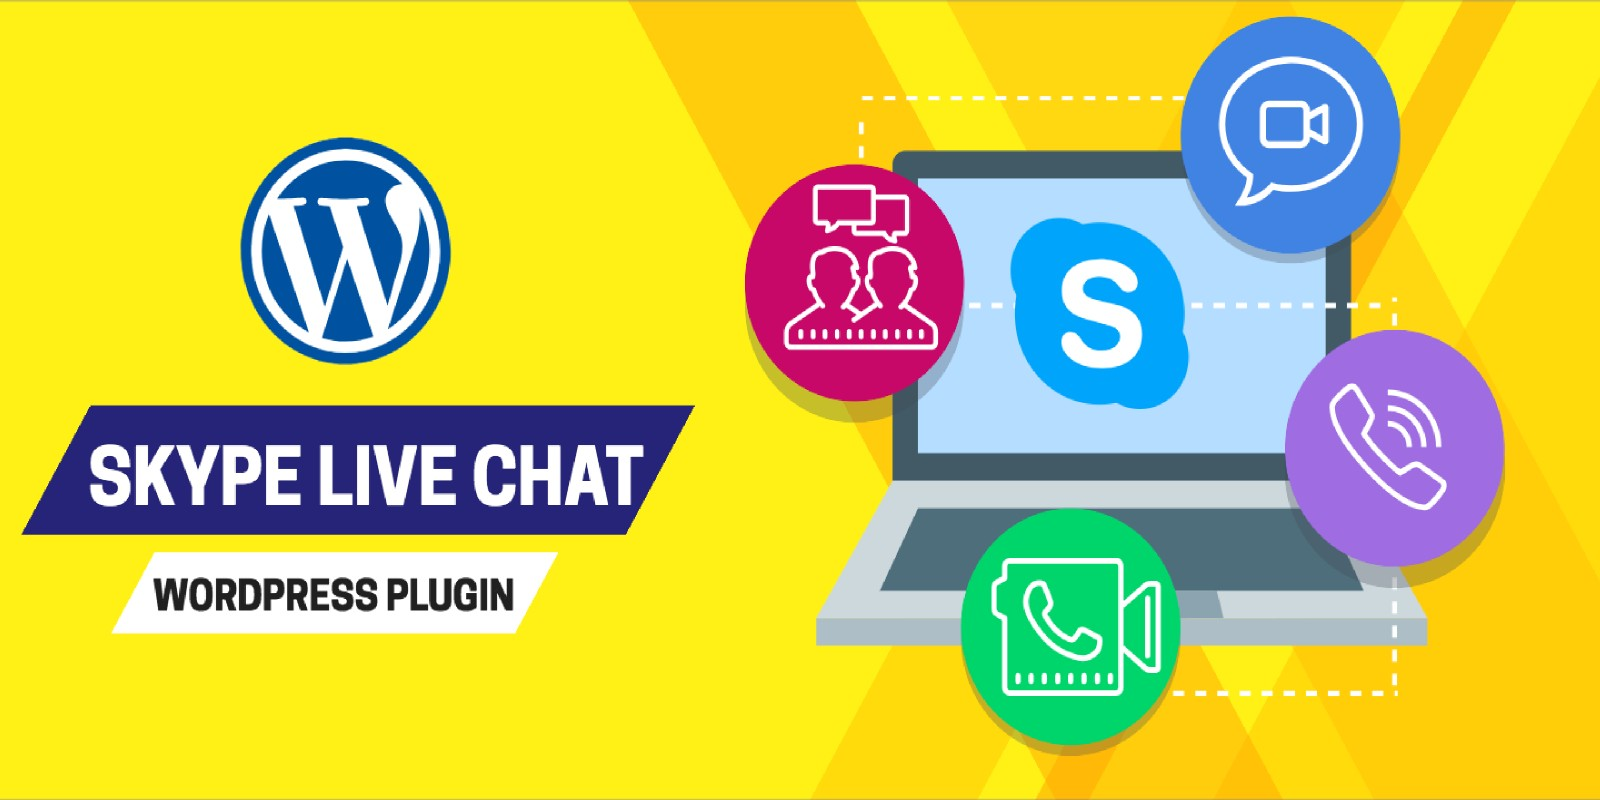 Skype Live Chat Wordpress Plugin